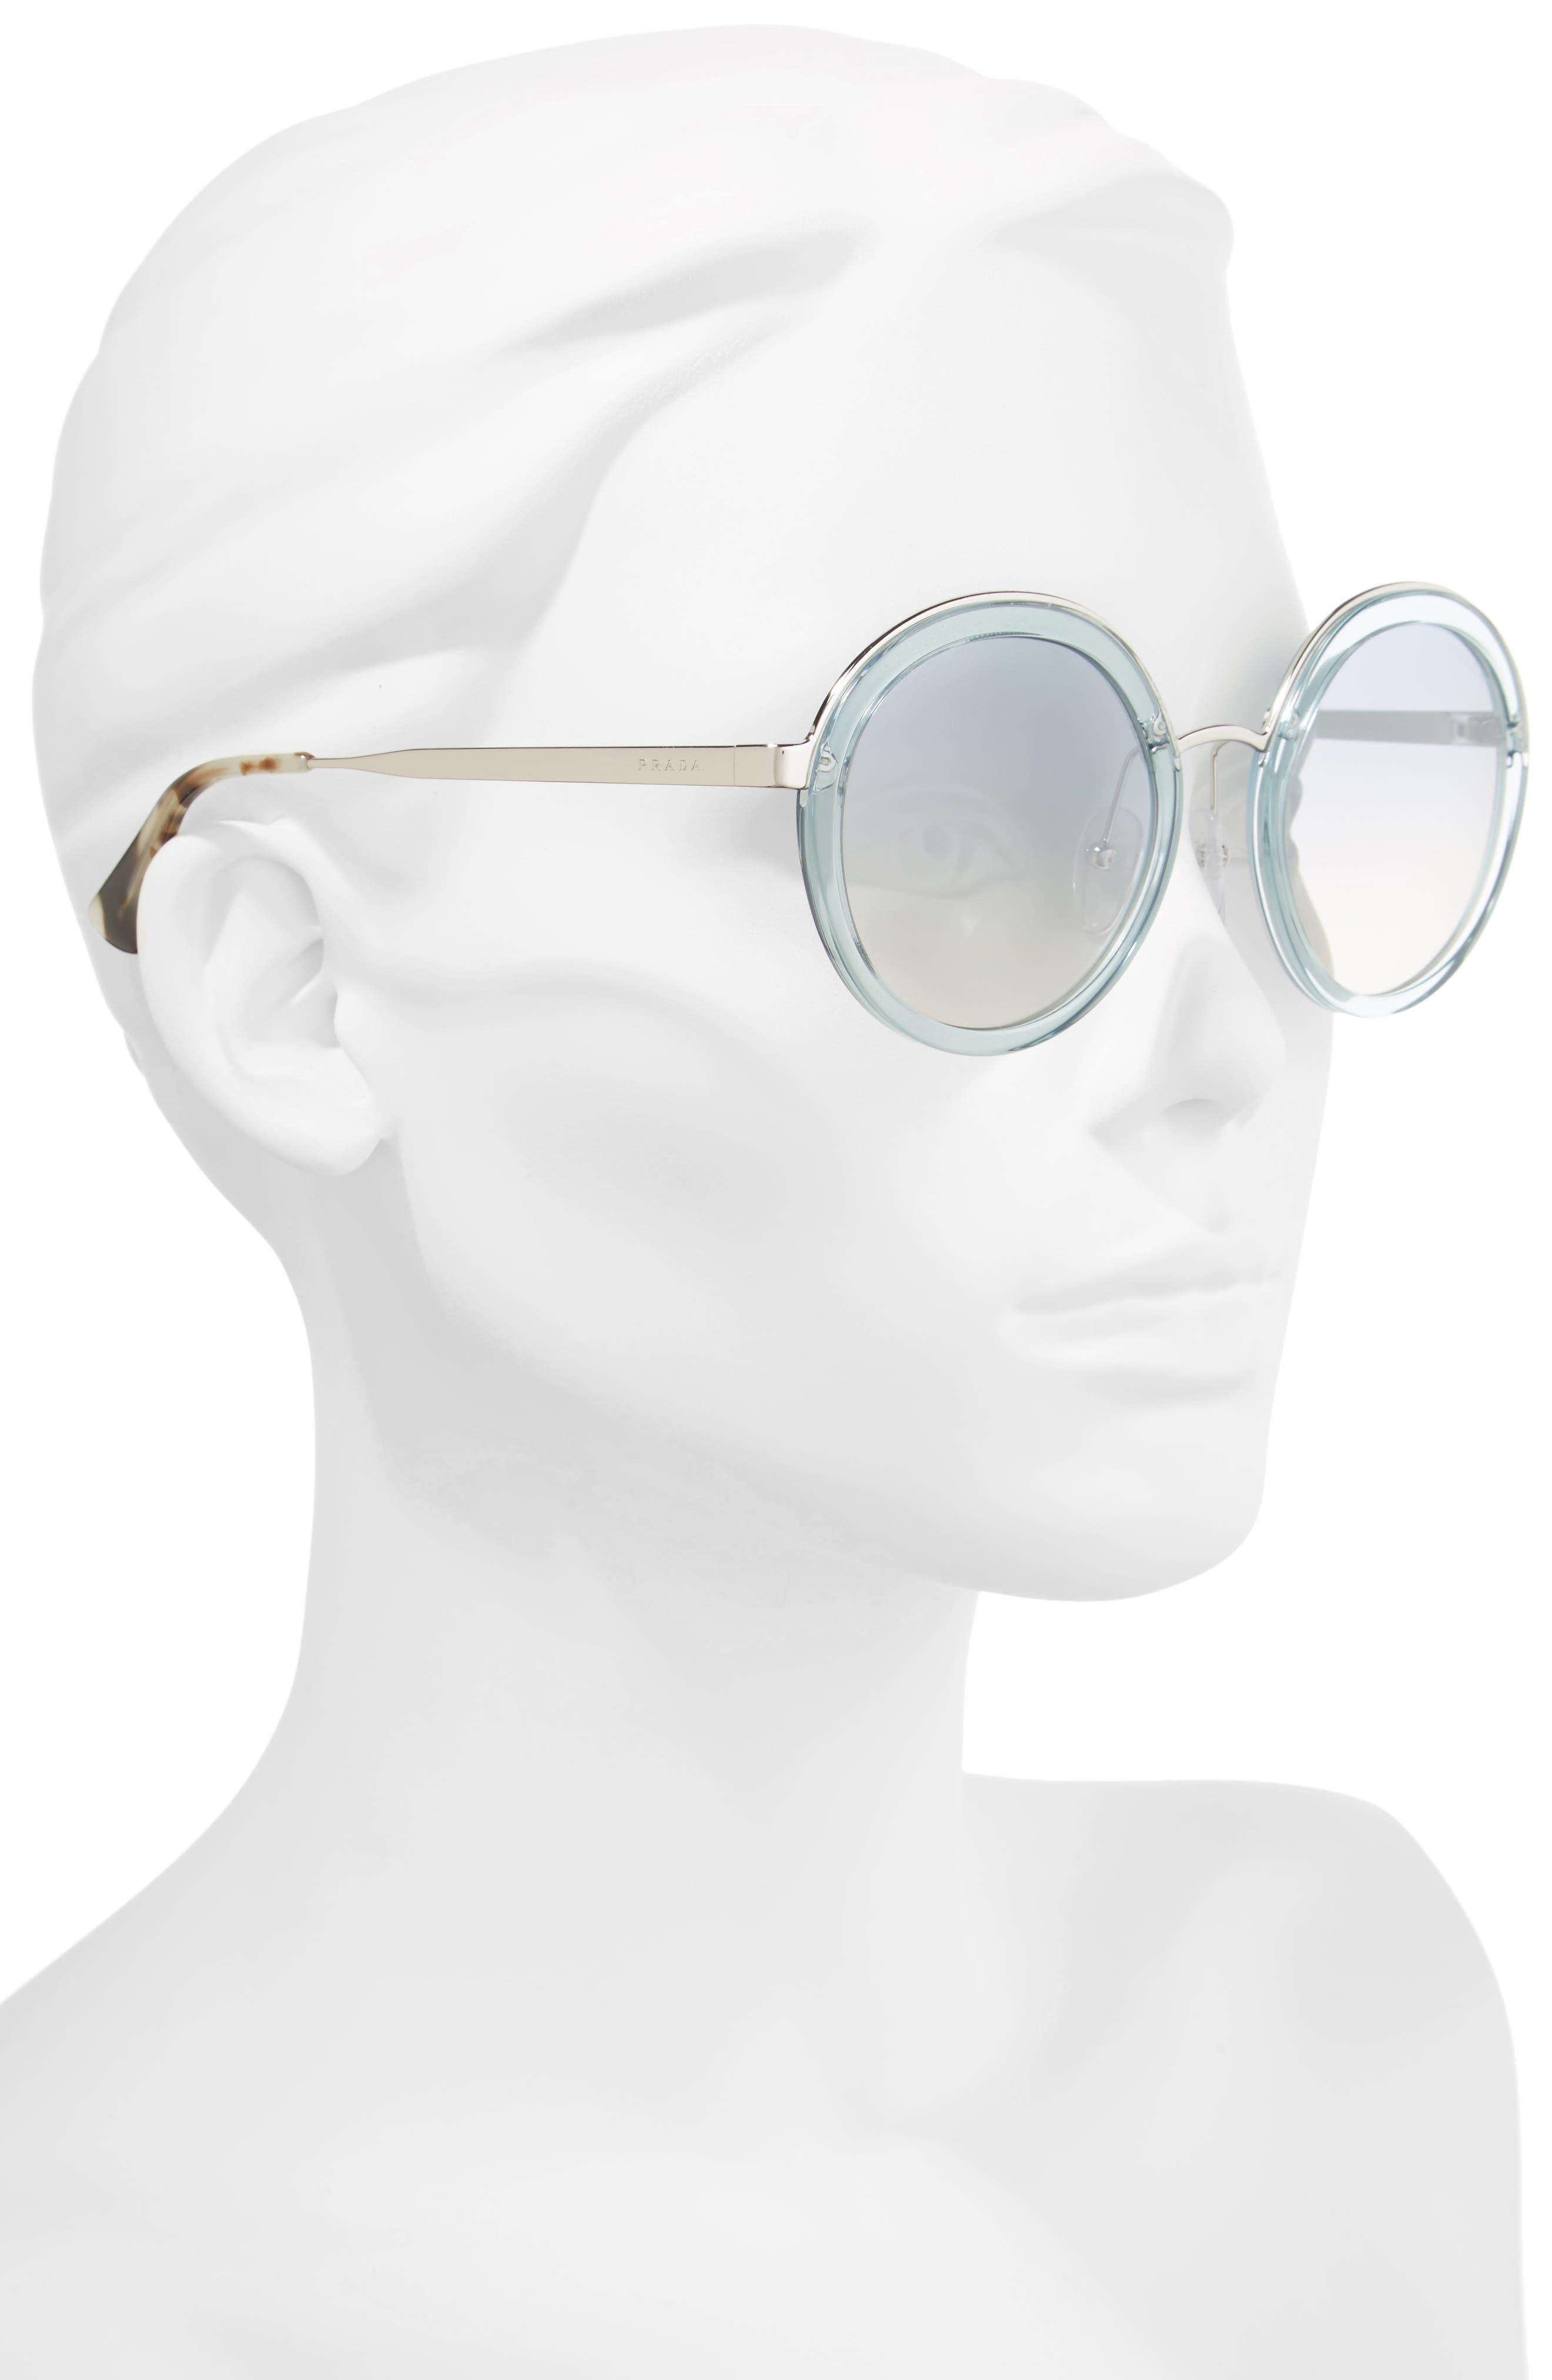 PRADA,                             54mm Round Sunglasses,                             Alternate thumbnail 2, color,                             400